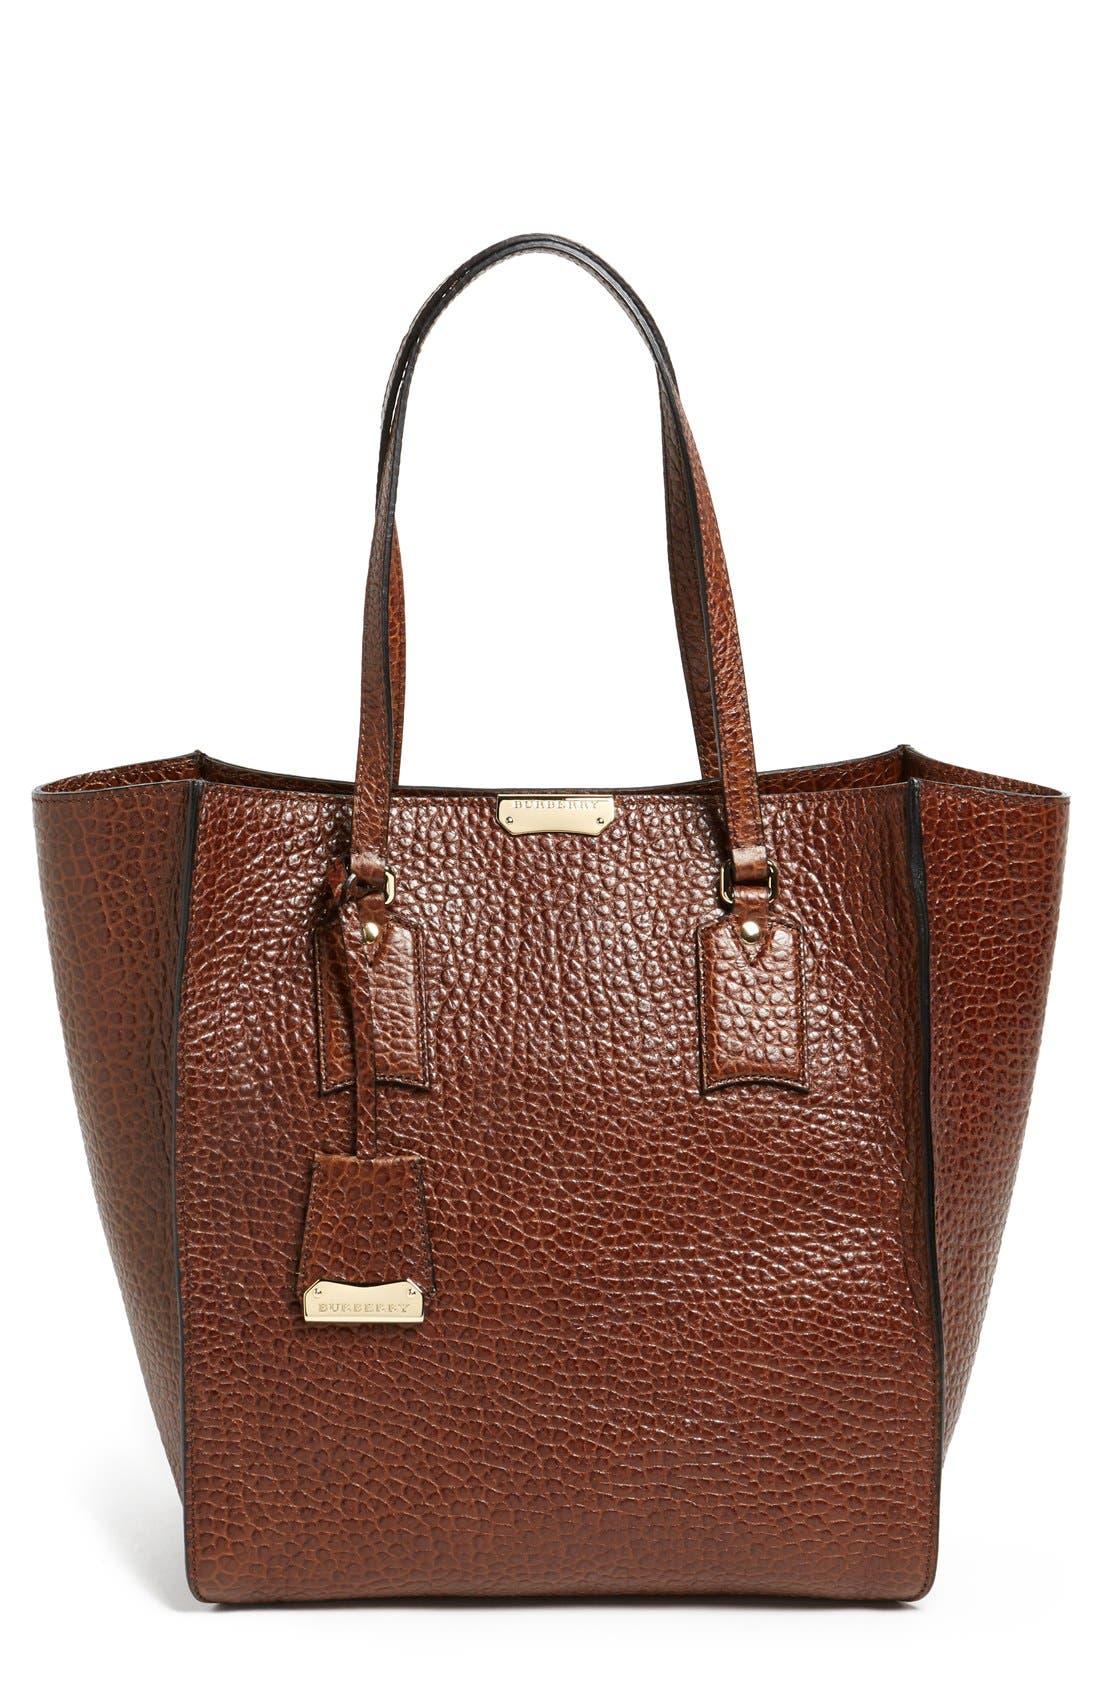 Alternate Image 1 Selected - Burberry 'Woodbury - Medium' Leather Tote